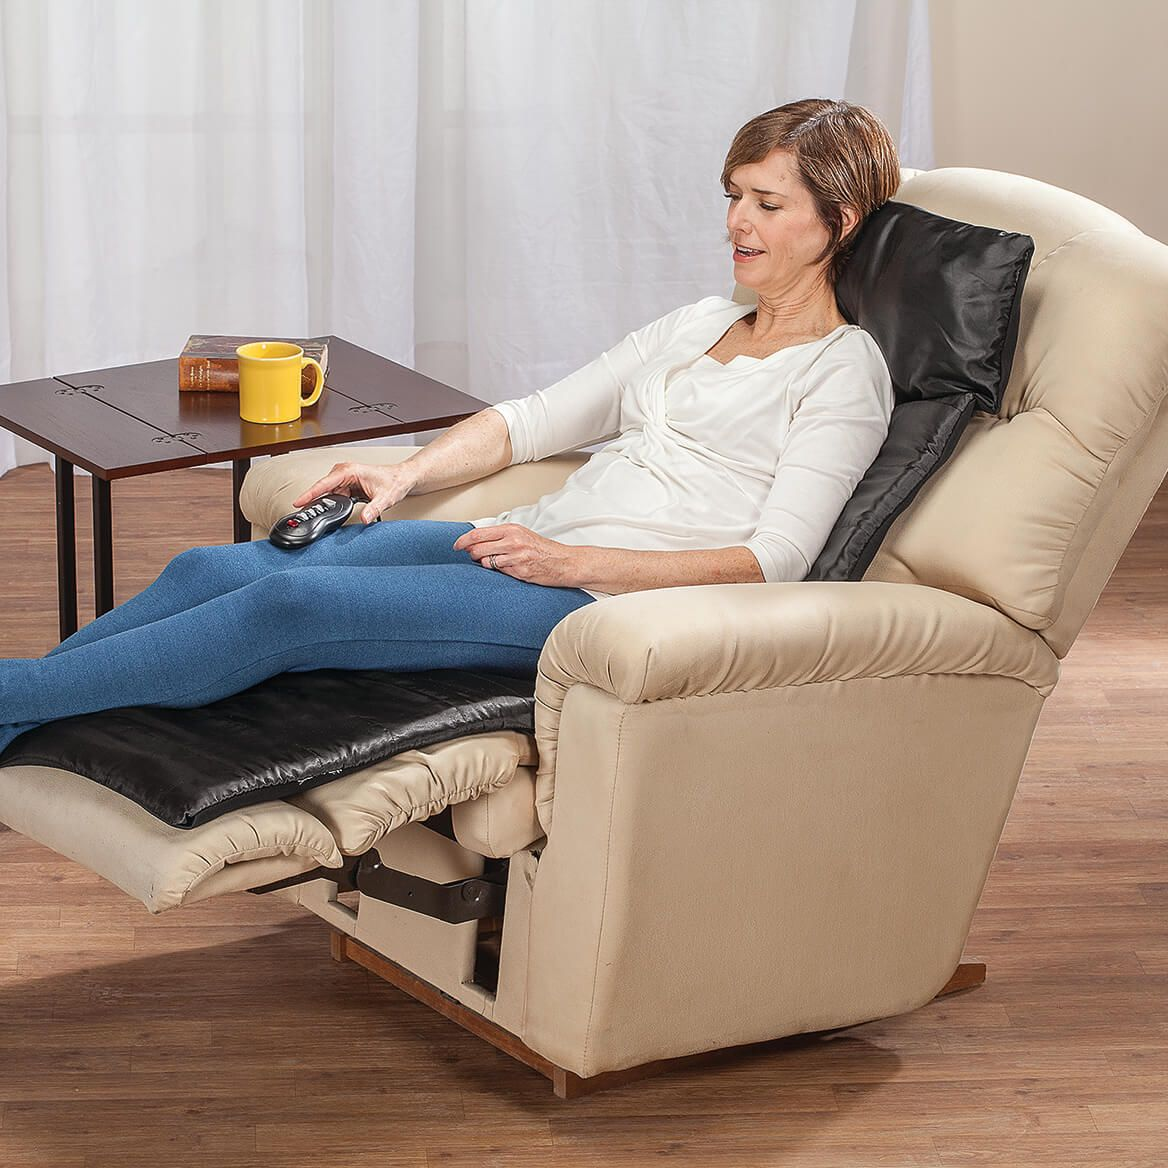 Full Length Body Massage Mat with Heat-368872